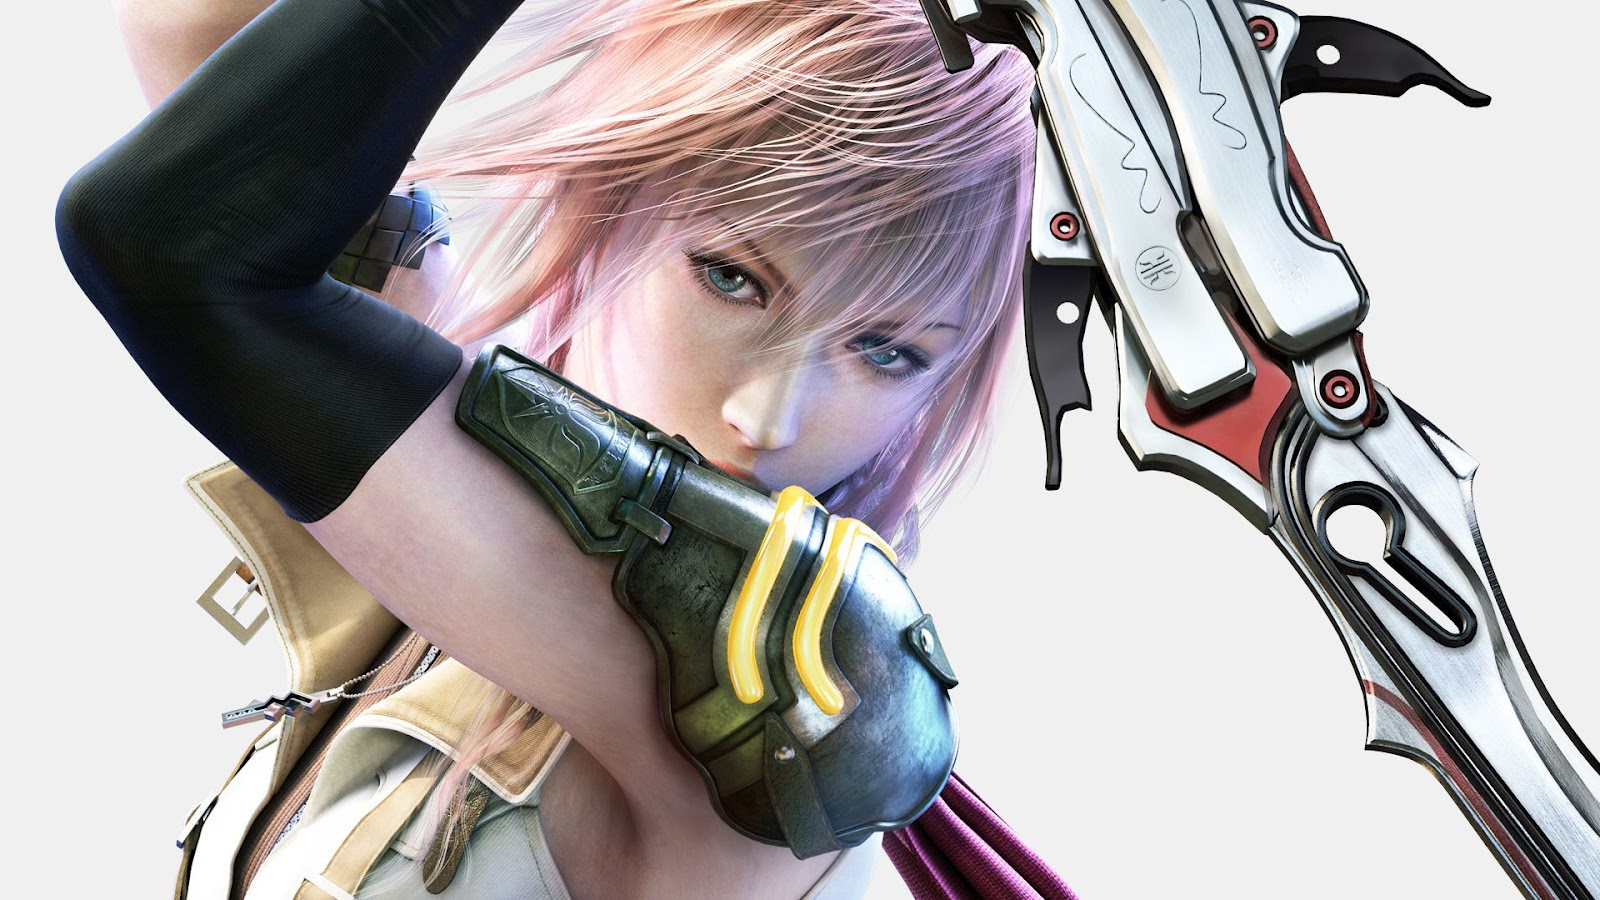 Final Fantasy Character Serah Farron Archer Realistic 3D Graphic HD Wallpaper